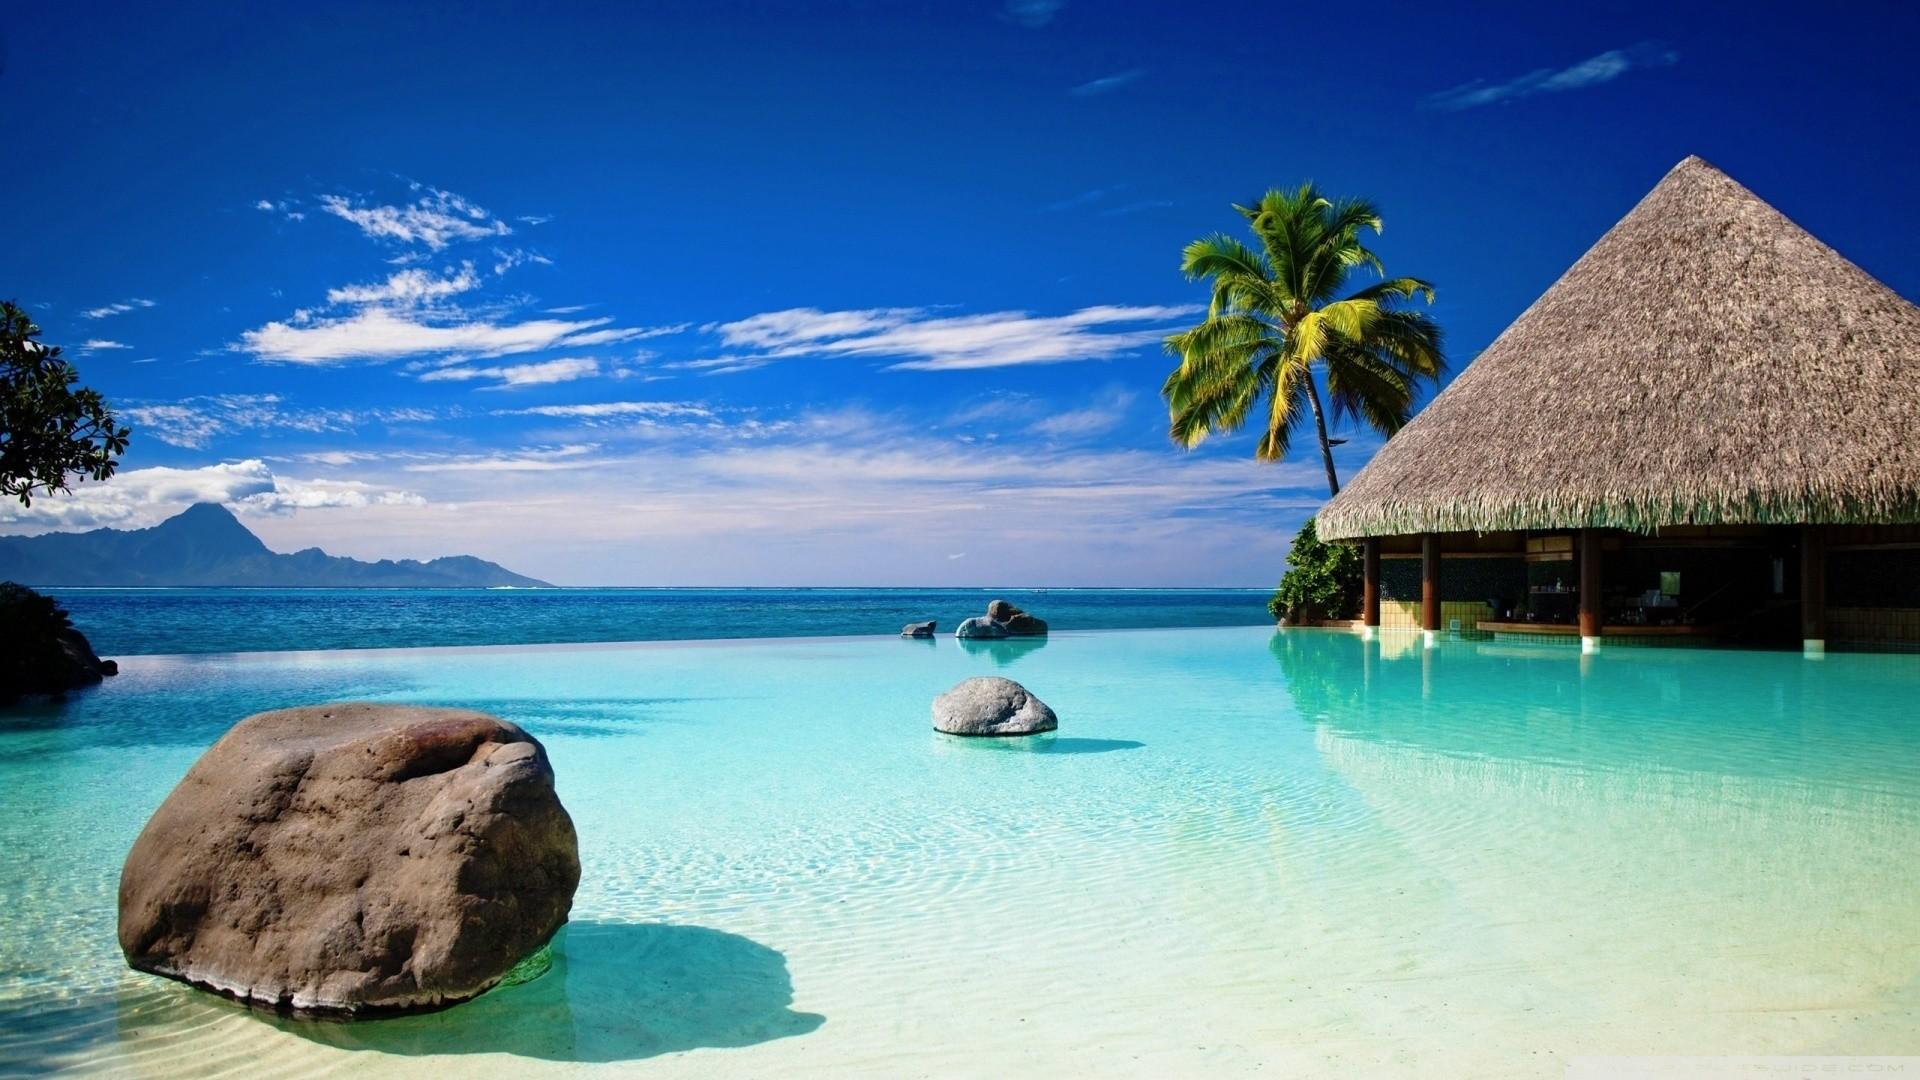 … bungalow in blue ocean water hd desktop wallpaper high …